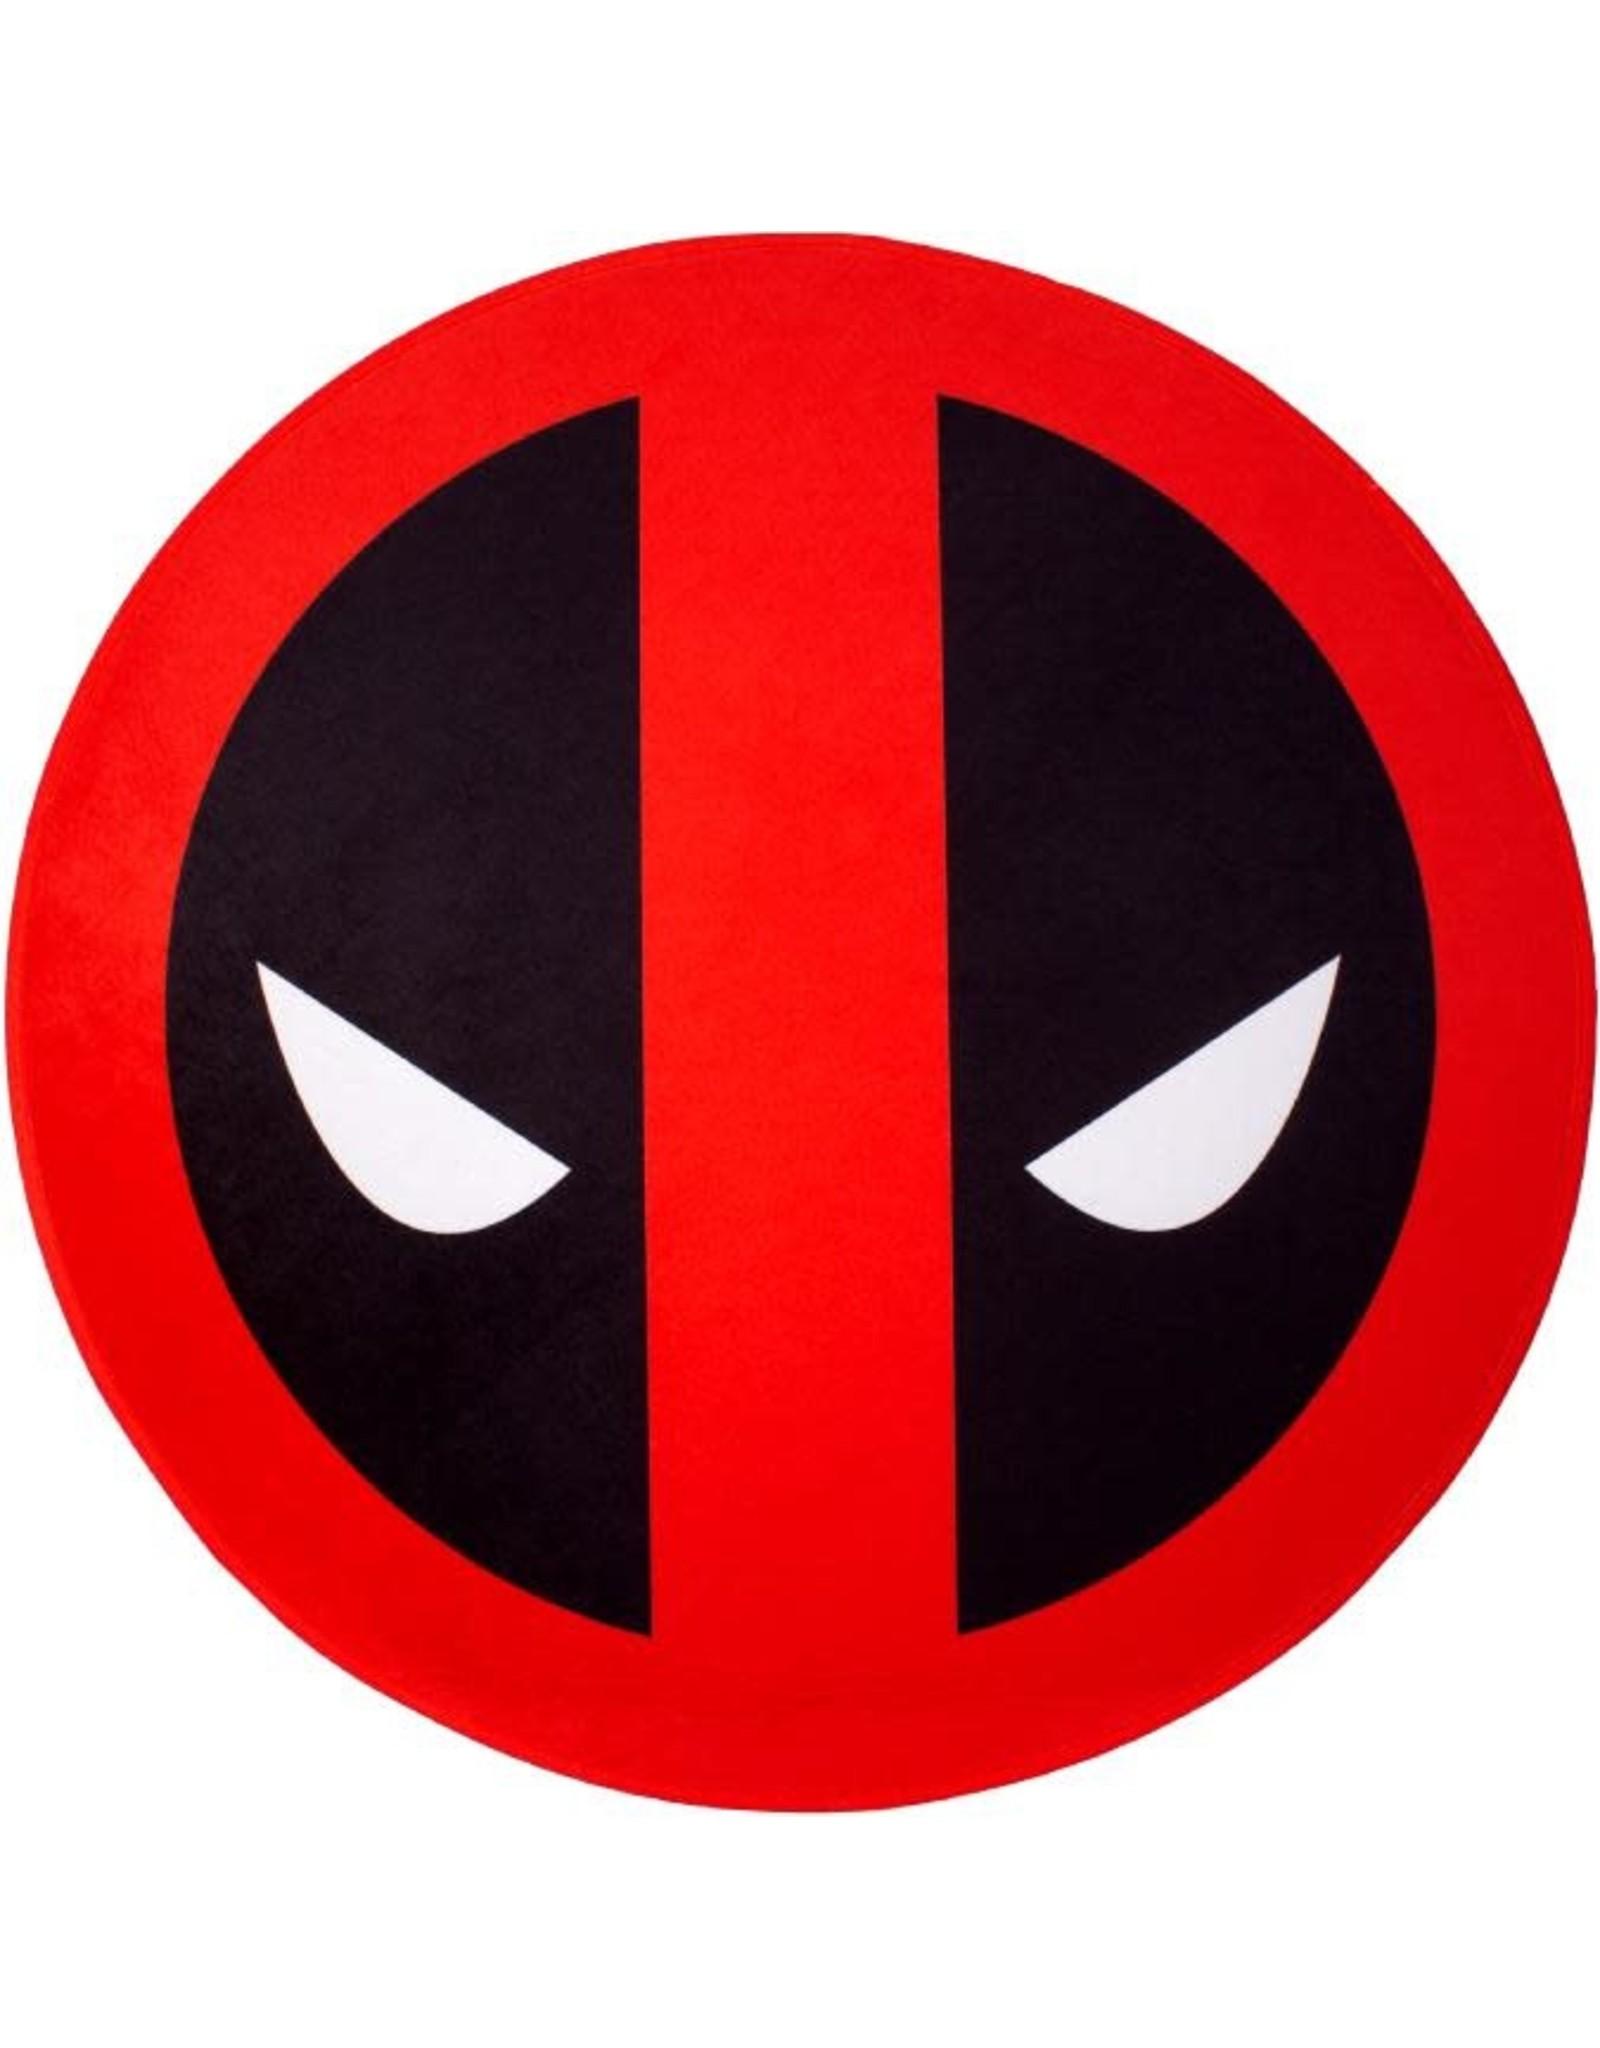 DEADPOOL - Microfiber mat - 80cm diameter - Deadpool Face